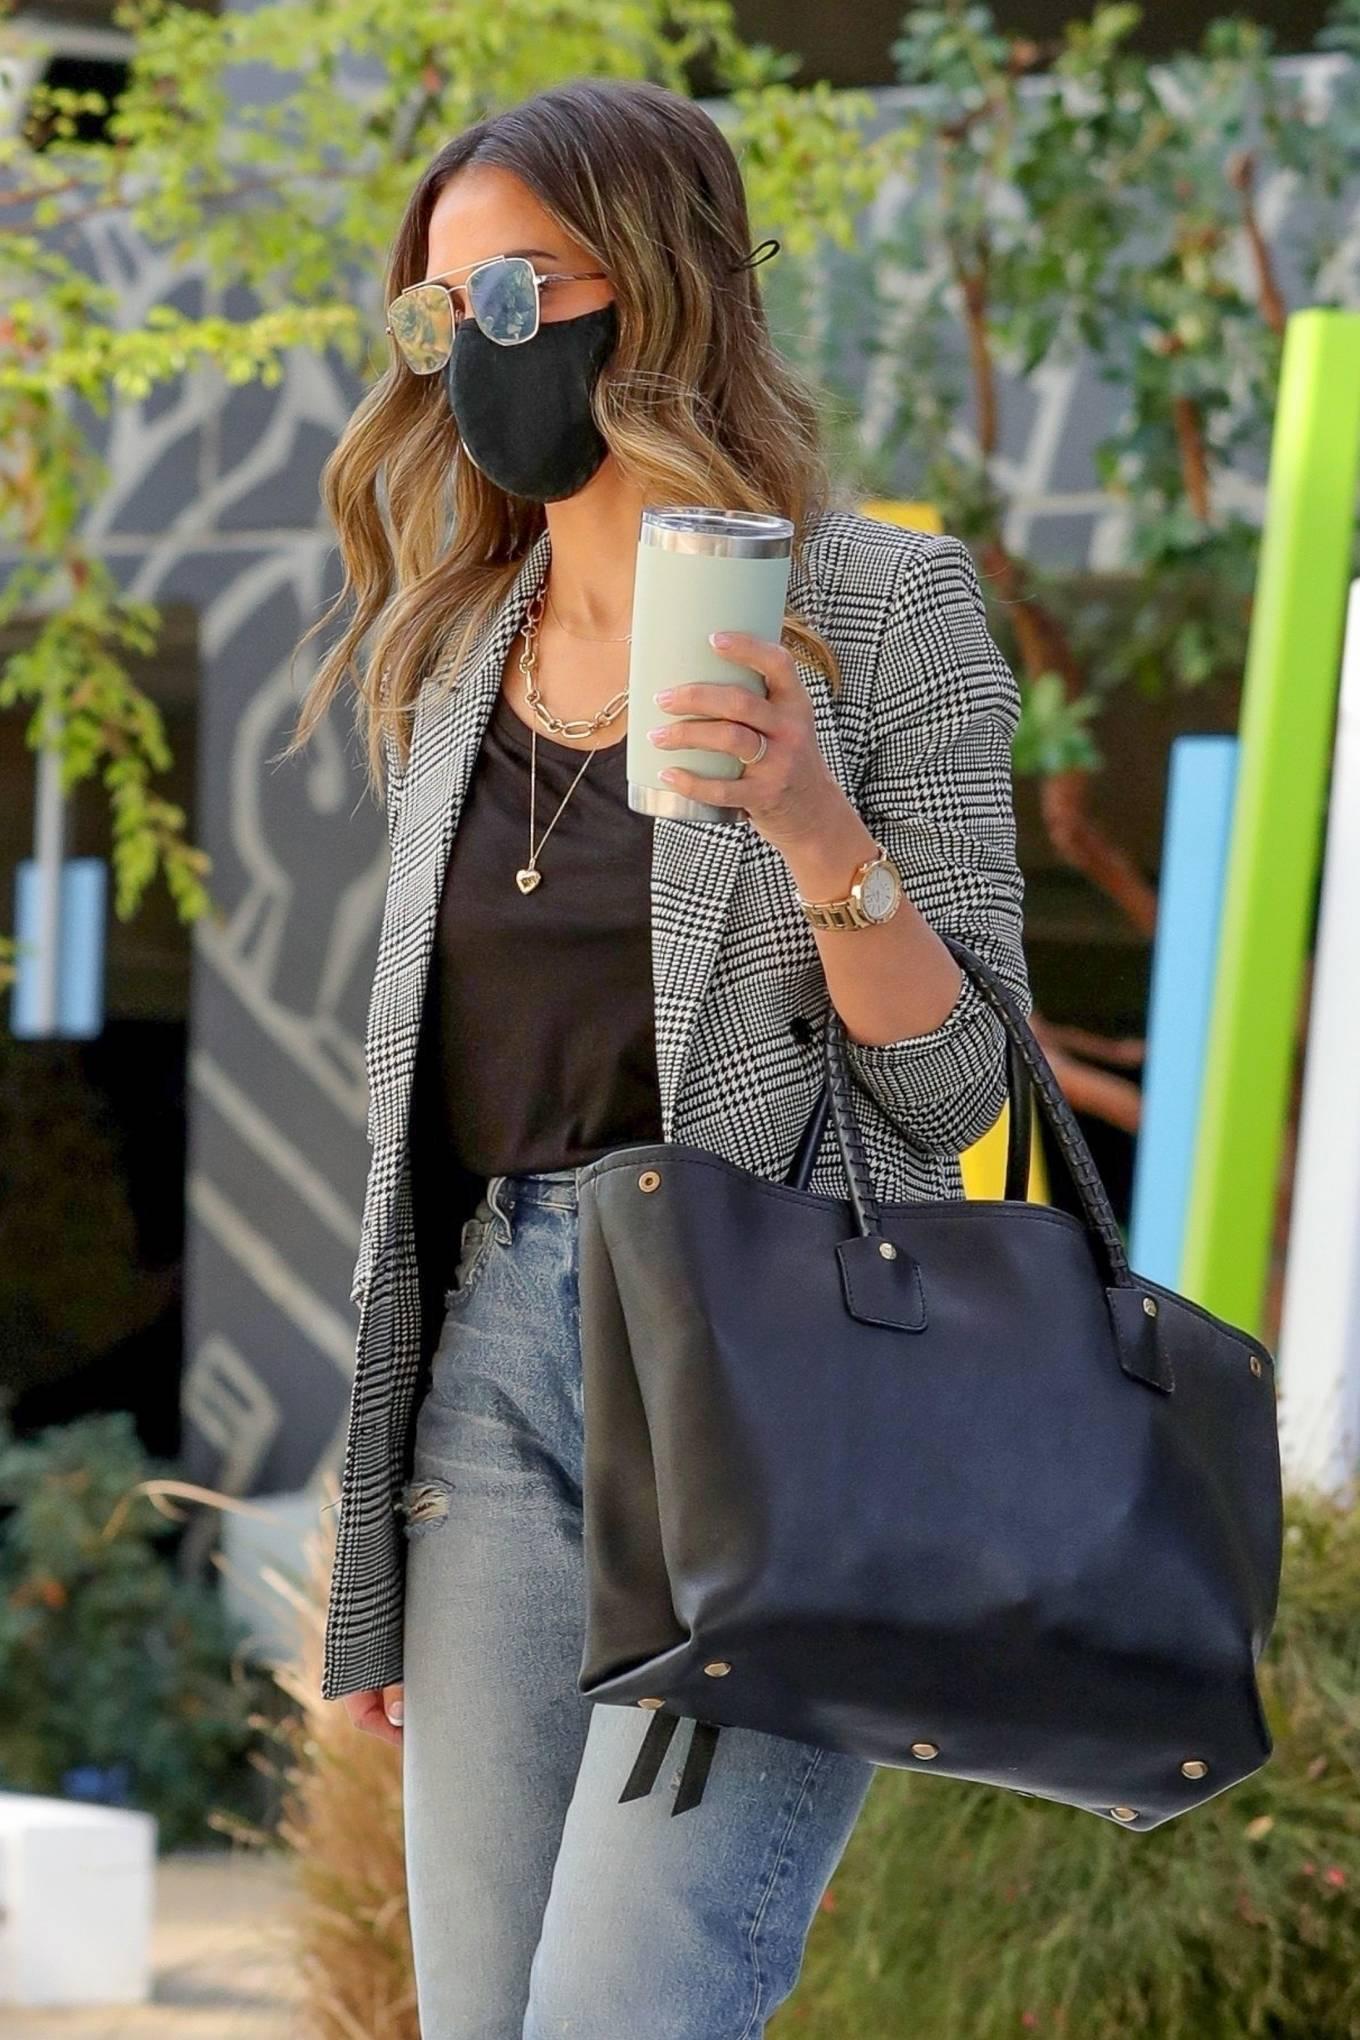 Jessica Alba - Pictured at the Honest Headquarters in Playa Vista